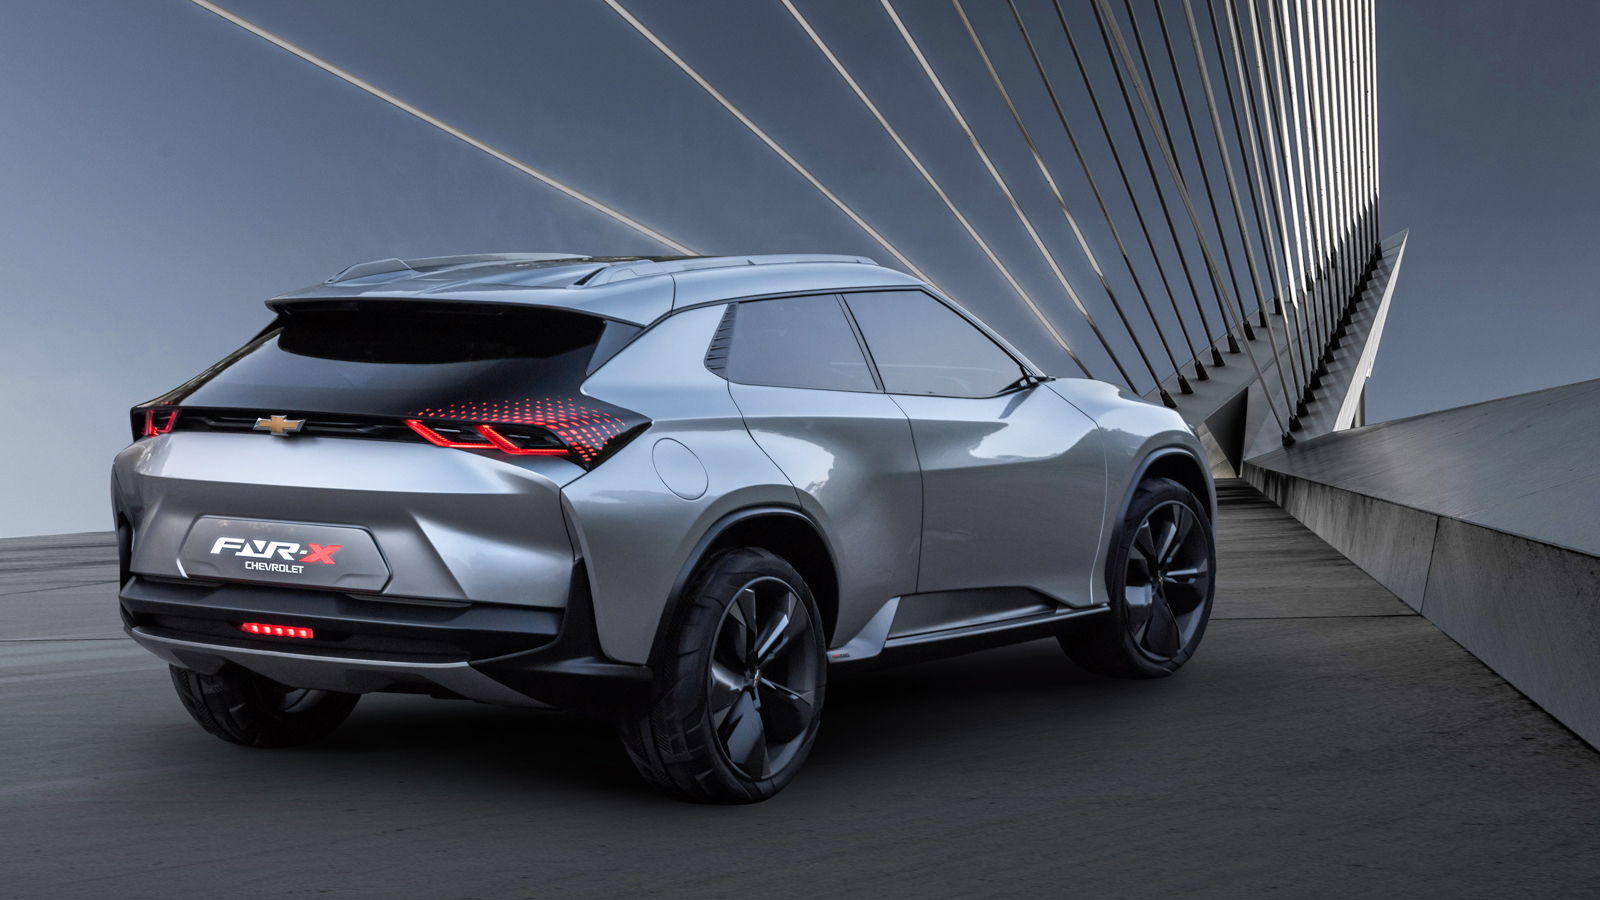 chevrolet-fnr-x-concept-2017-rear-angle-2